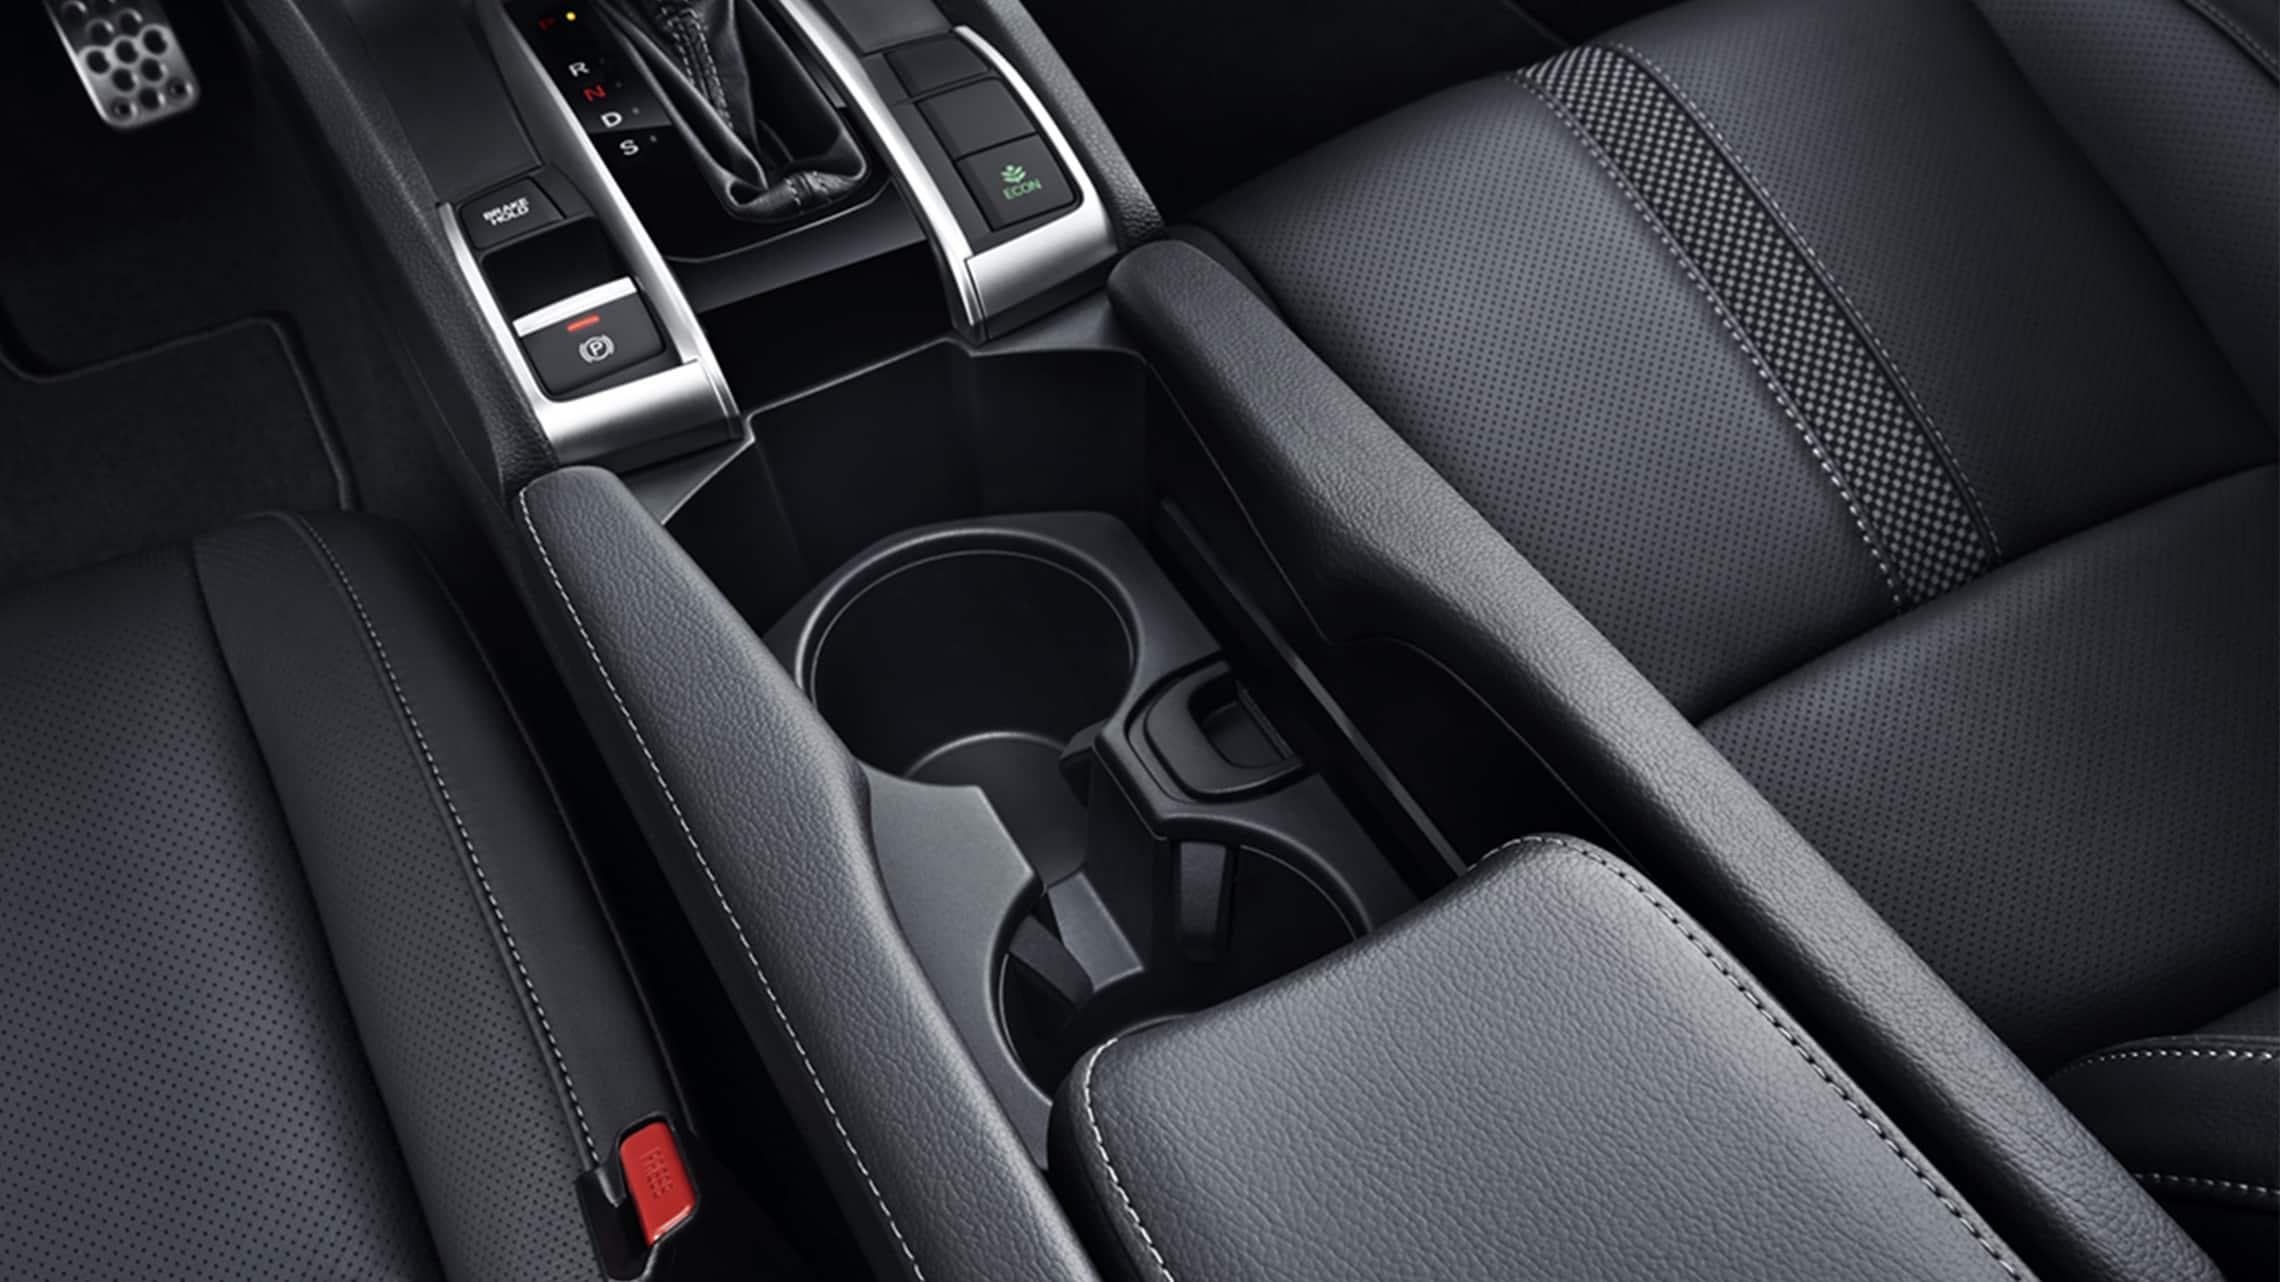 Detalle del portavasos en el Honda Civic Sport Touring Hatchback2020.